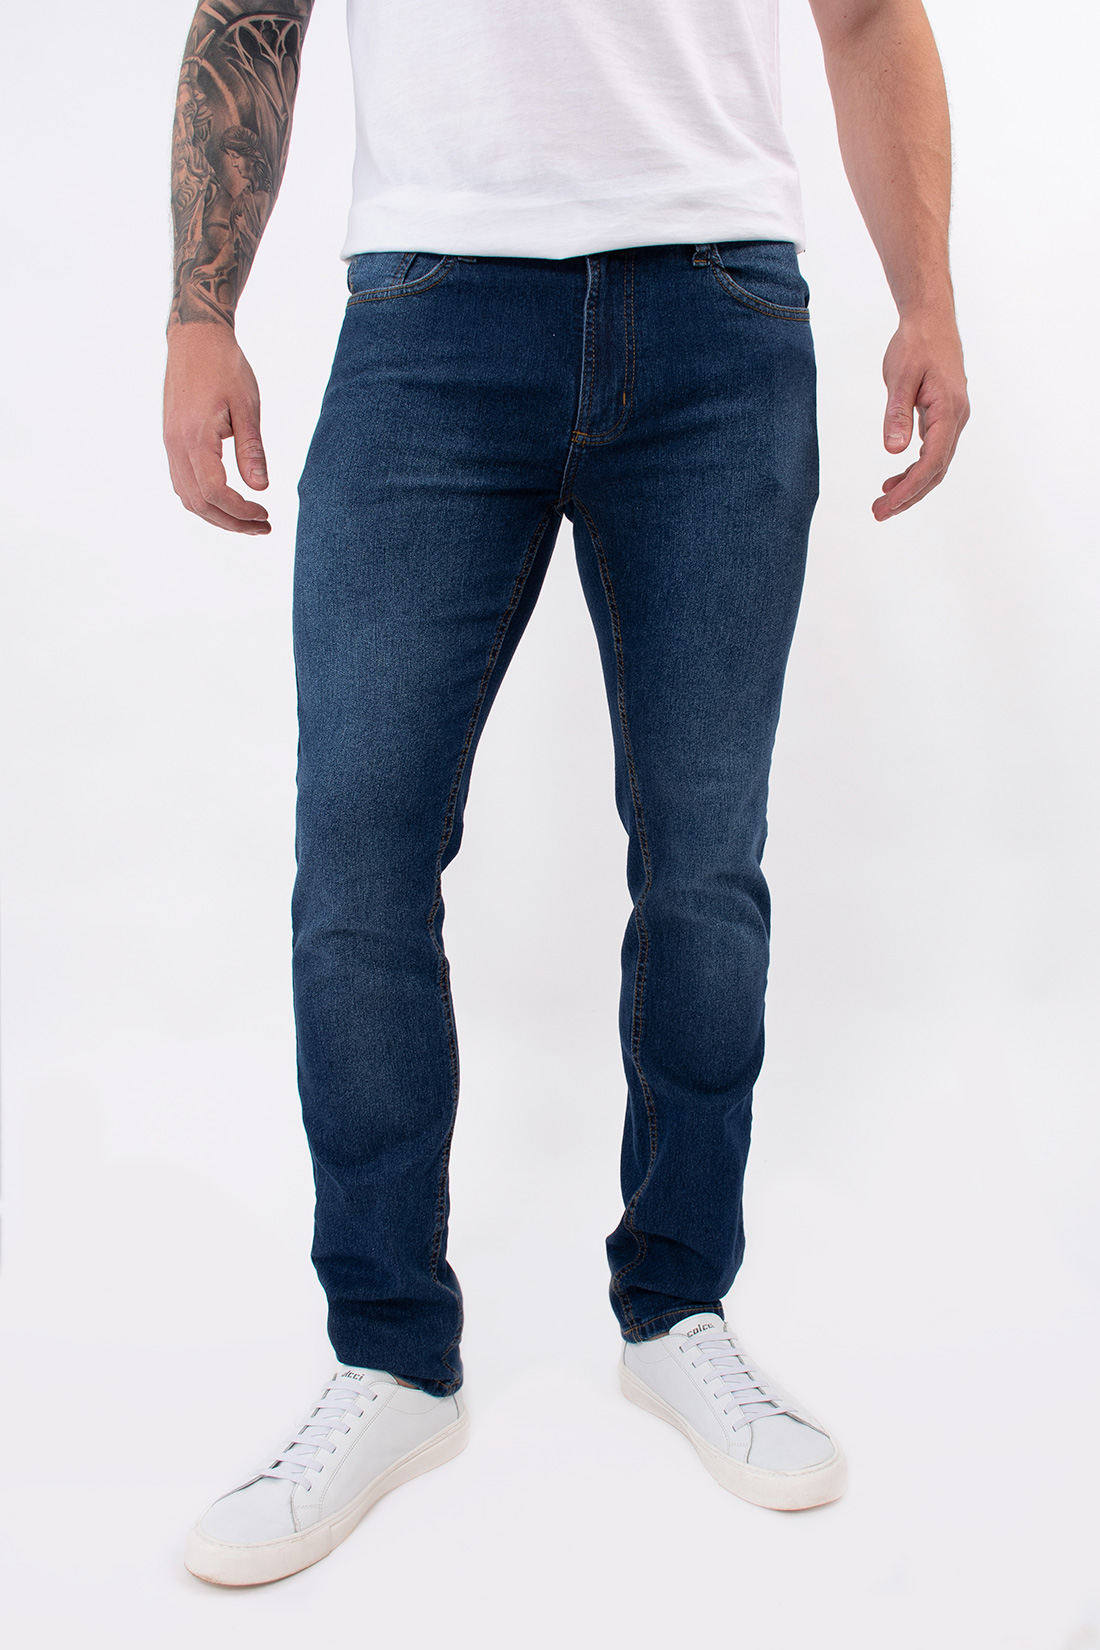 Calca Jeans Colcci Felipe